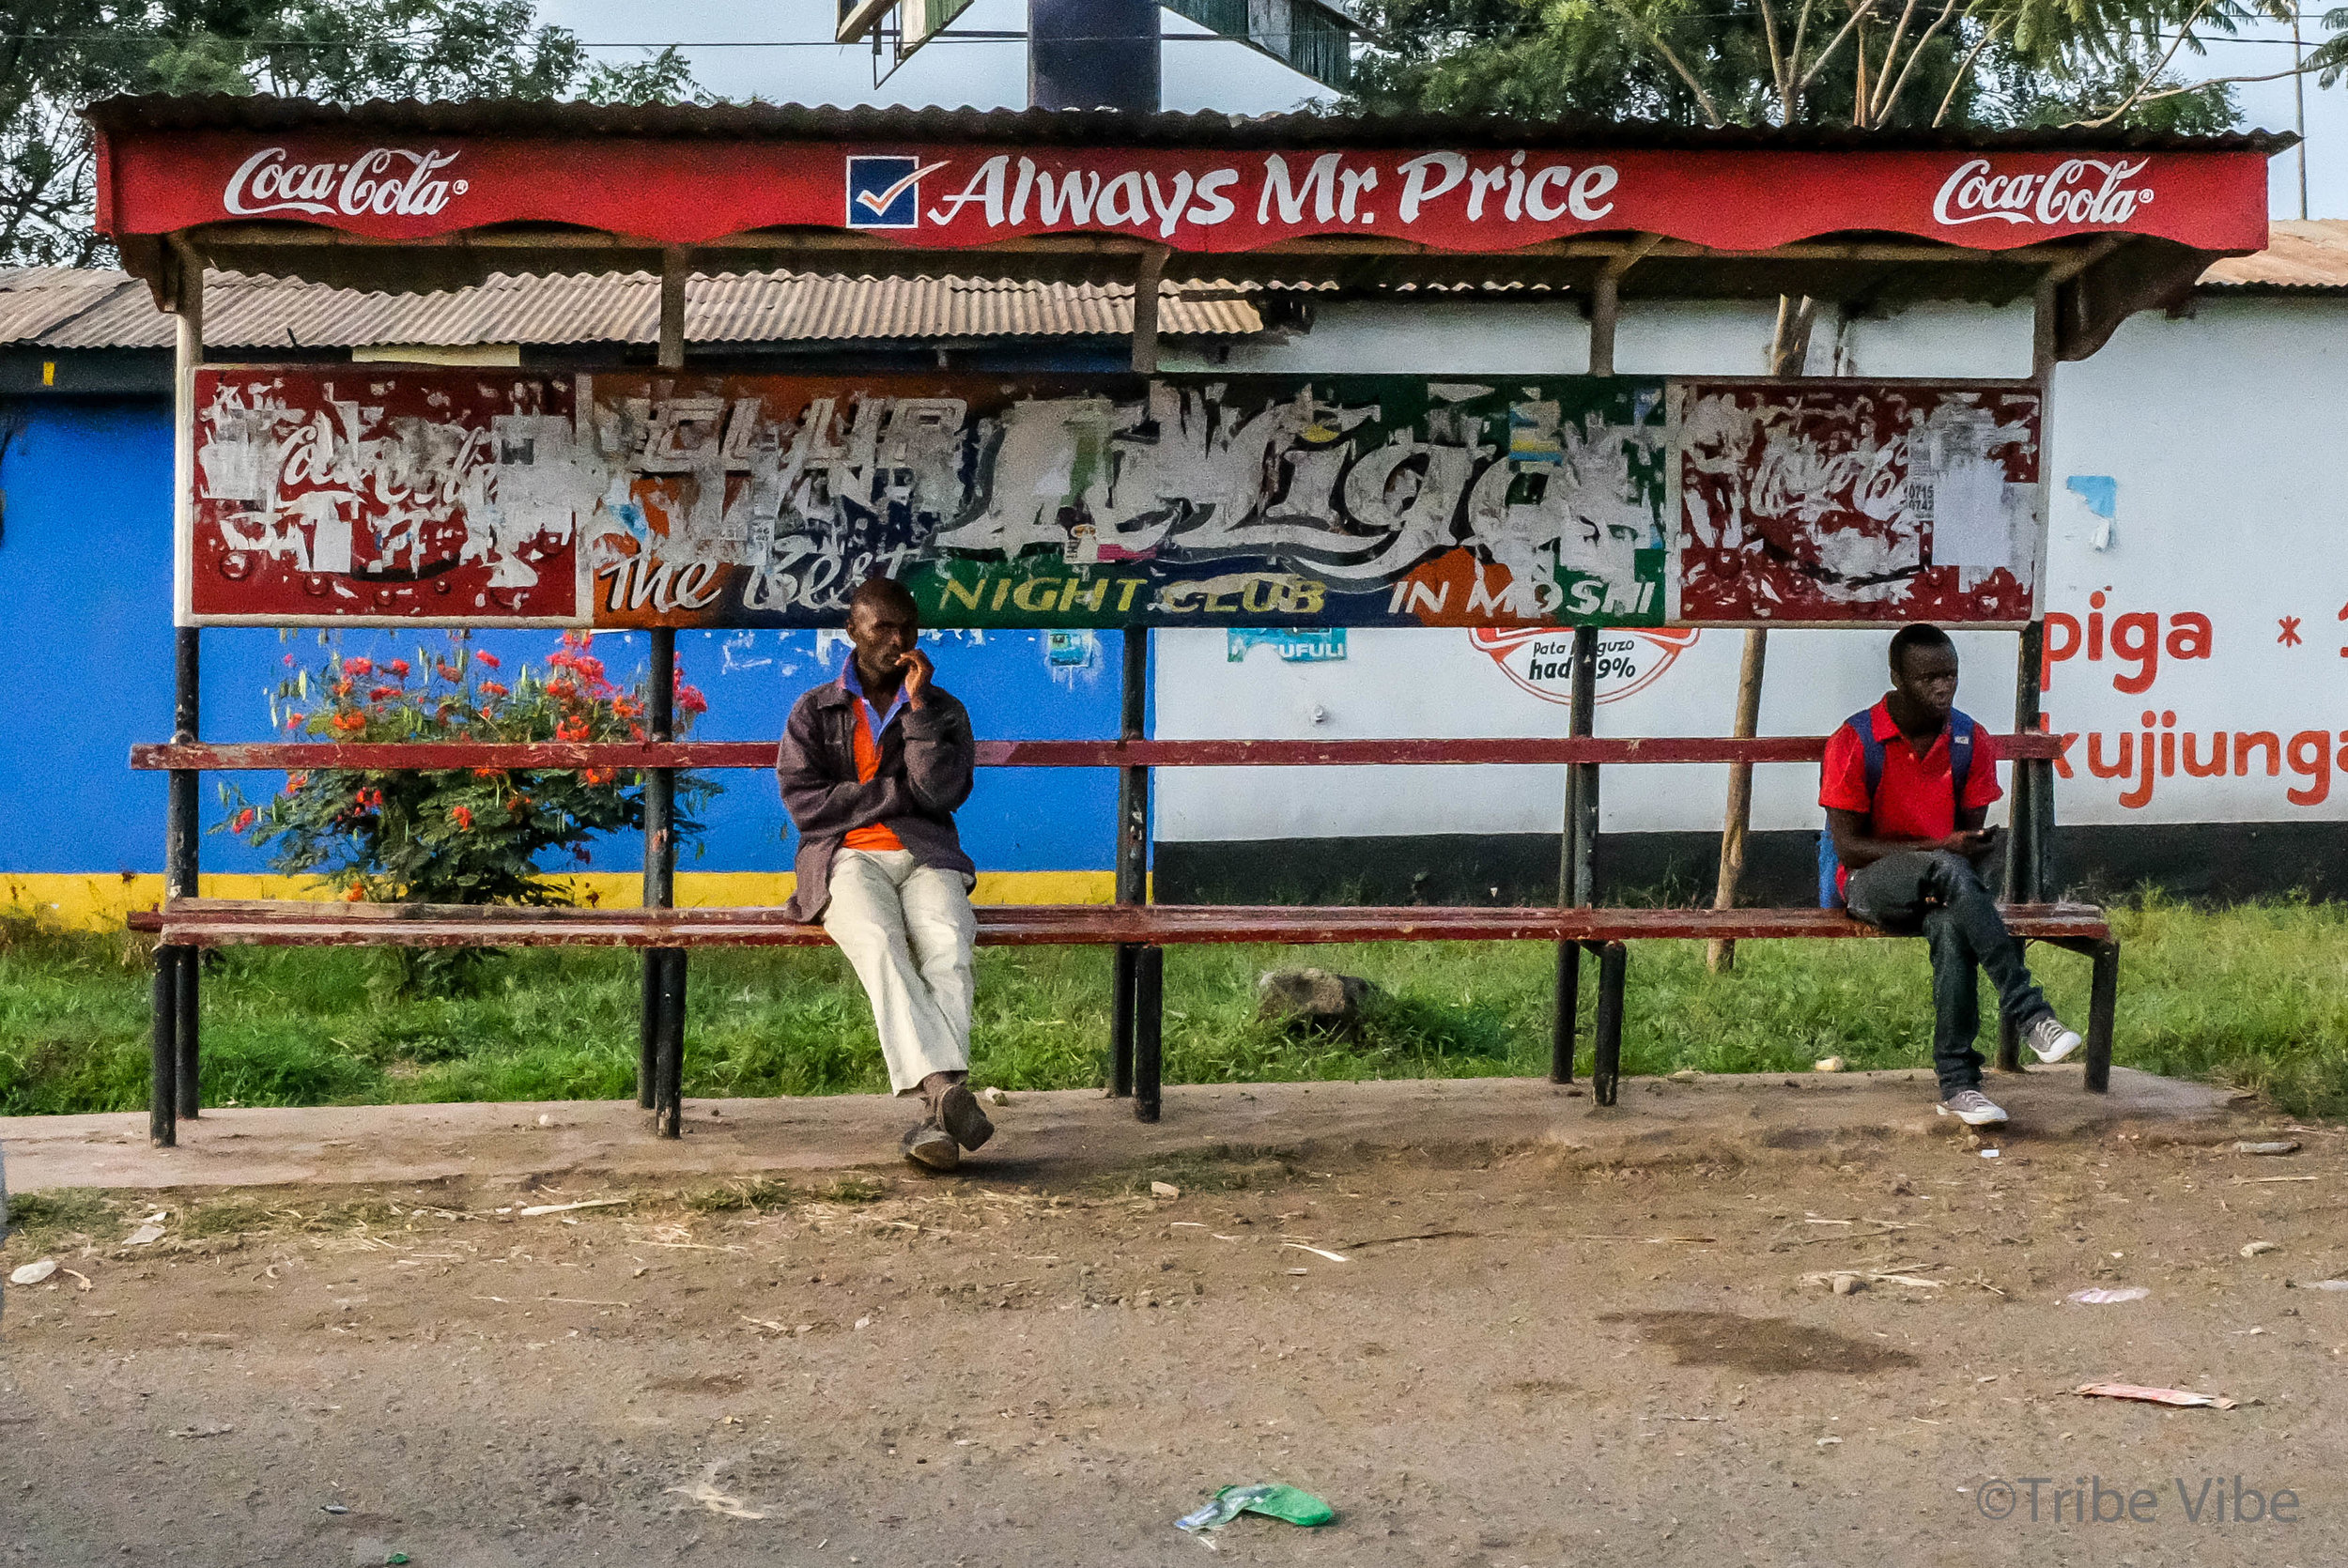 Waiting for the bus in Moshi, Tanzania